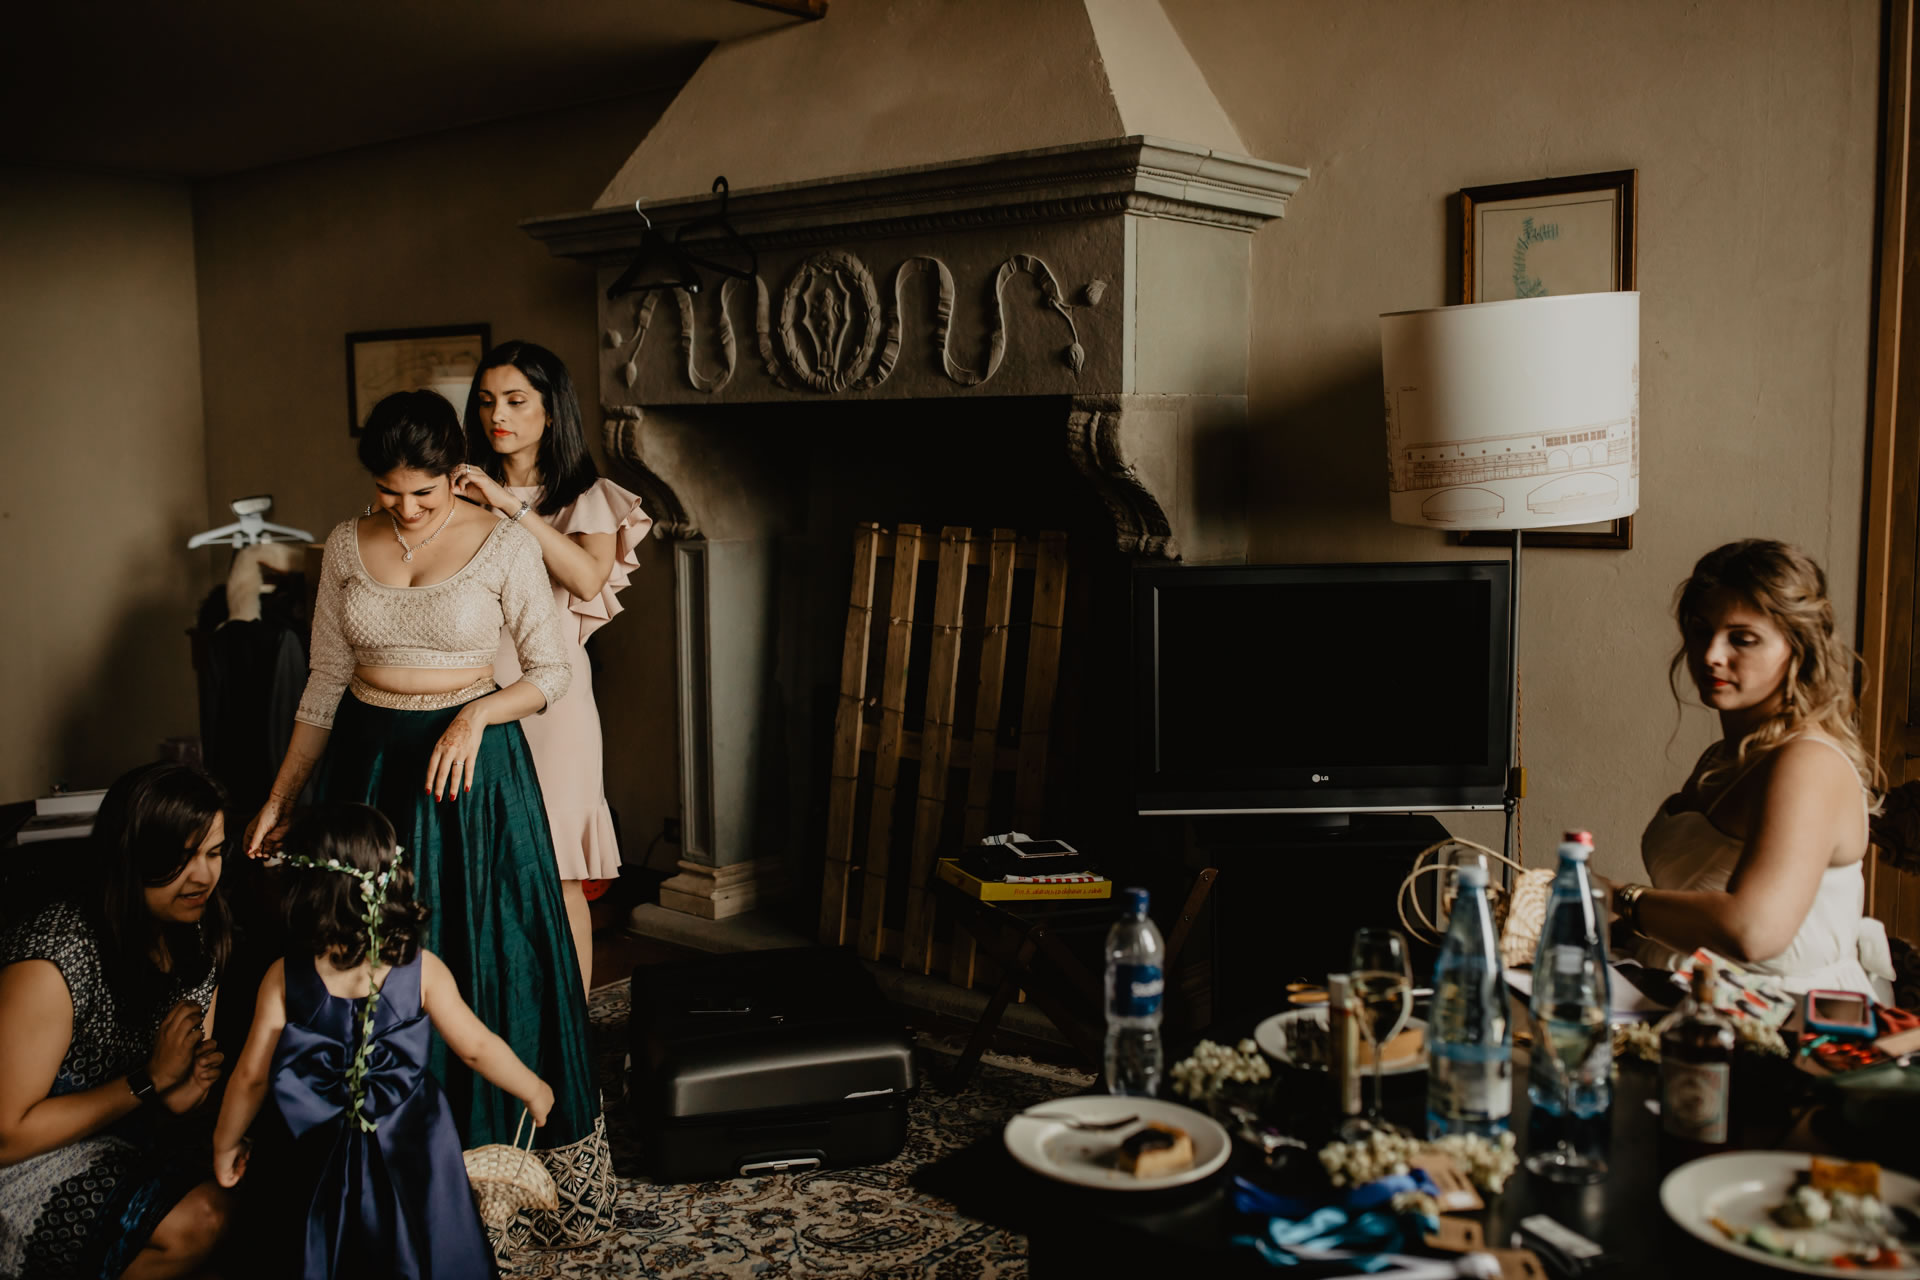 - 35 :: Indian wedding ceremony at Villa Pitiana :: Luxury wedding photography - 34 ::  - 35